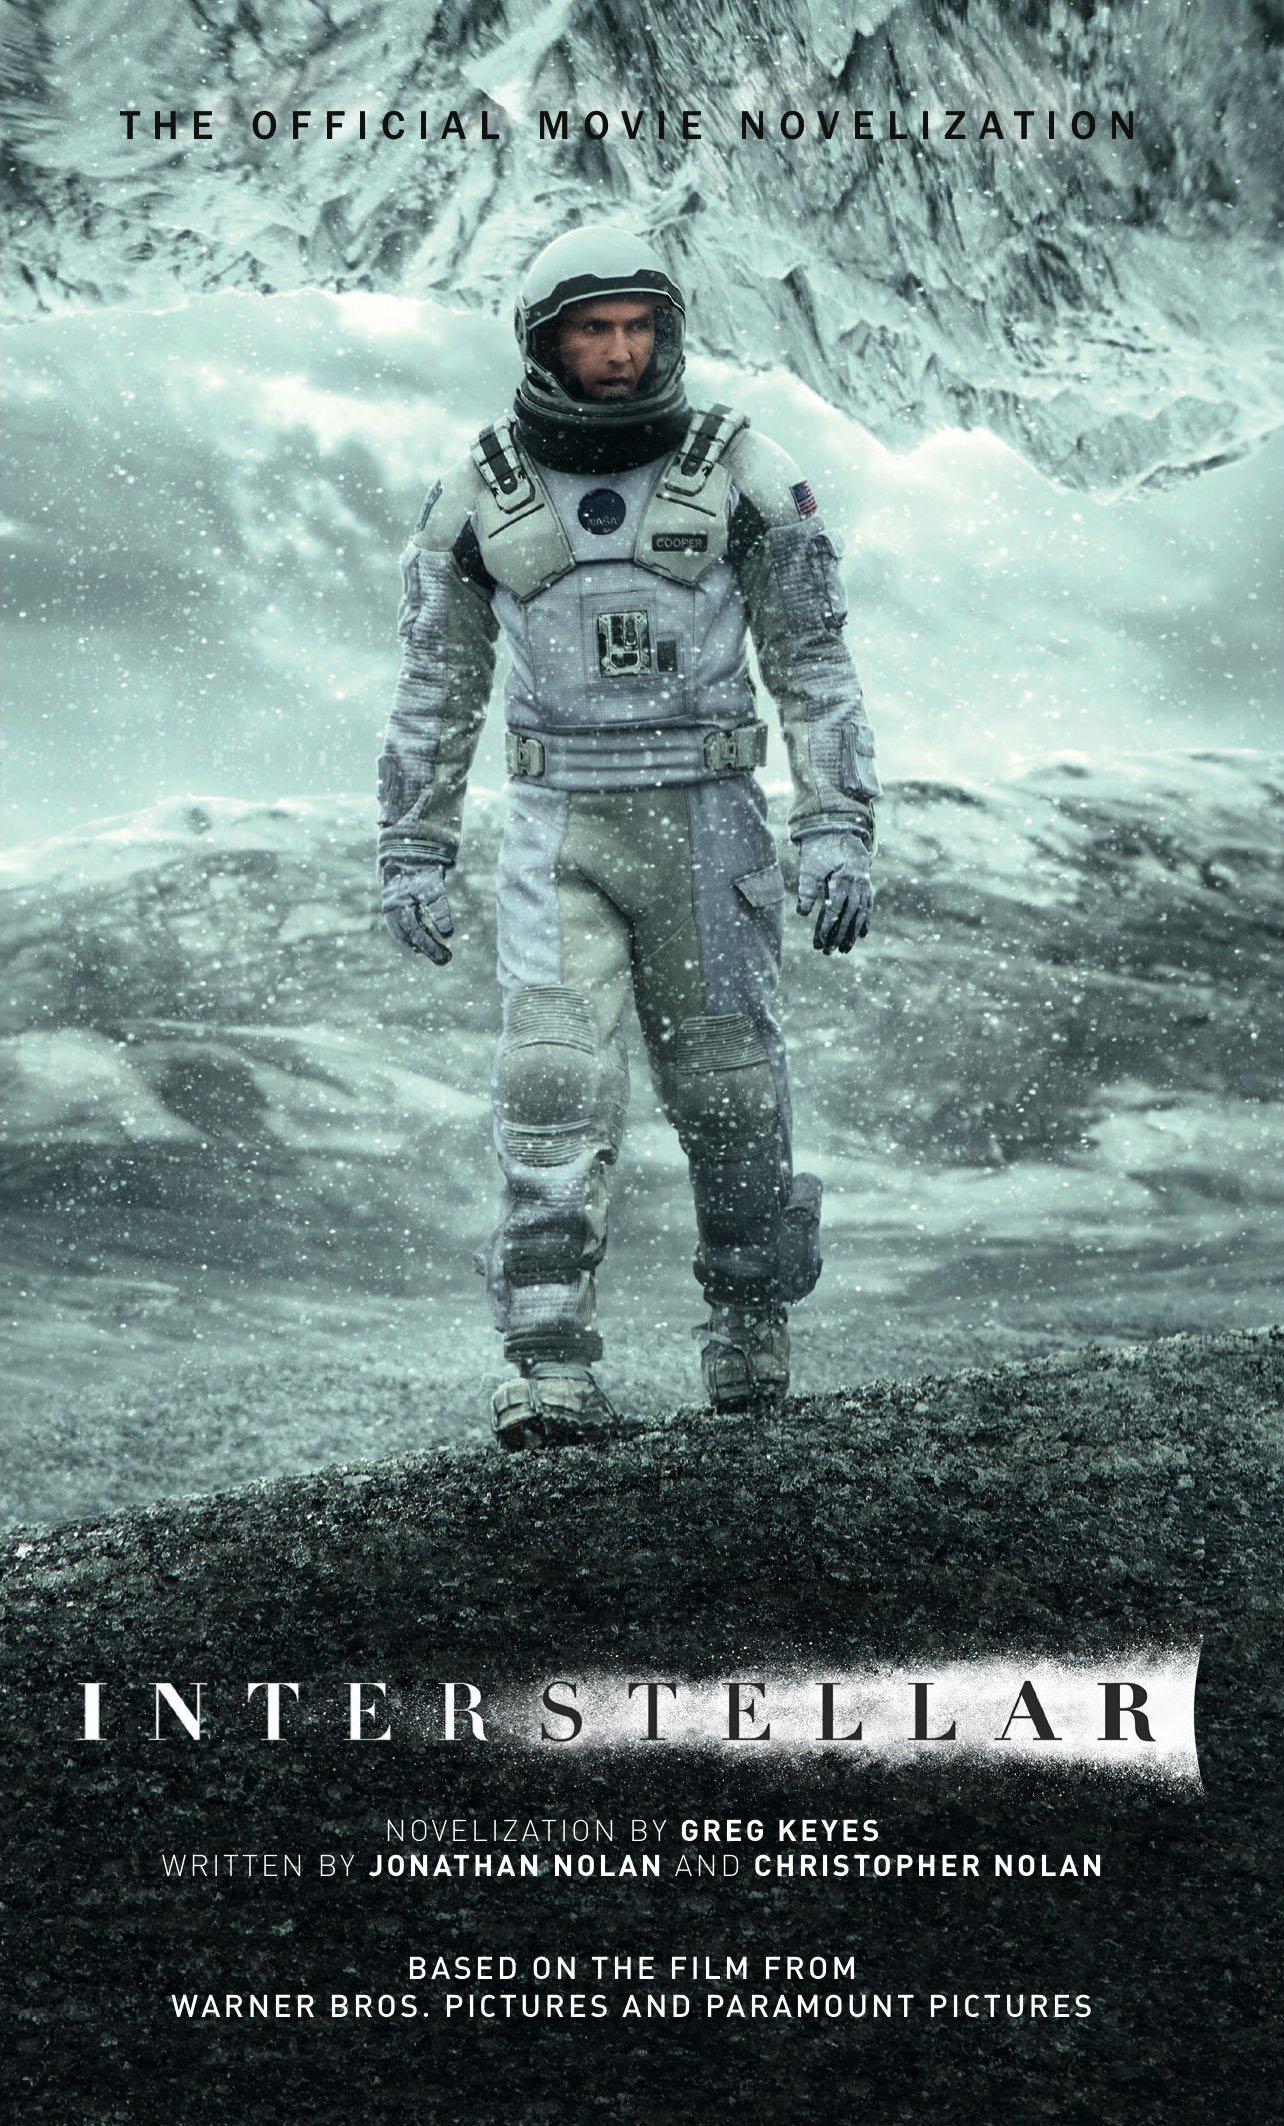 فيلم سينمايي interstellar (در ميان ستارگان) محصول سال 2014